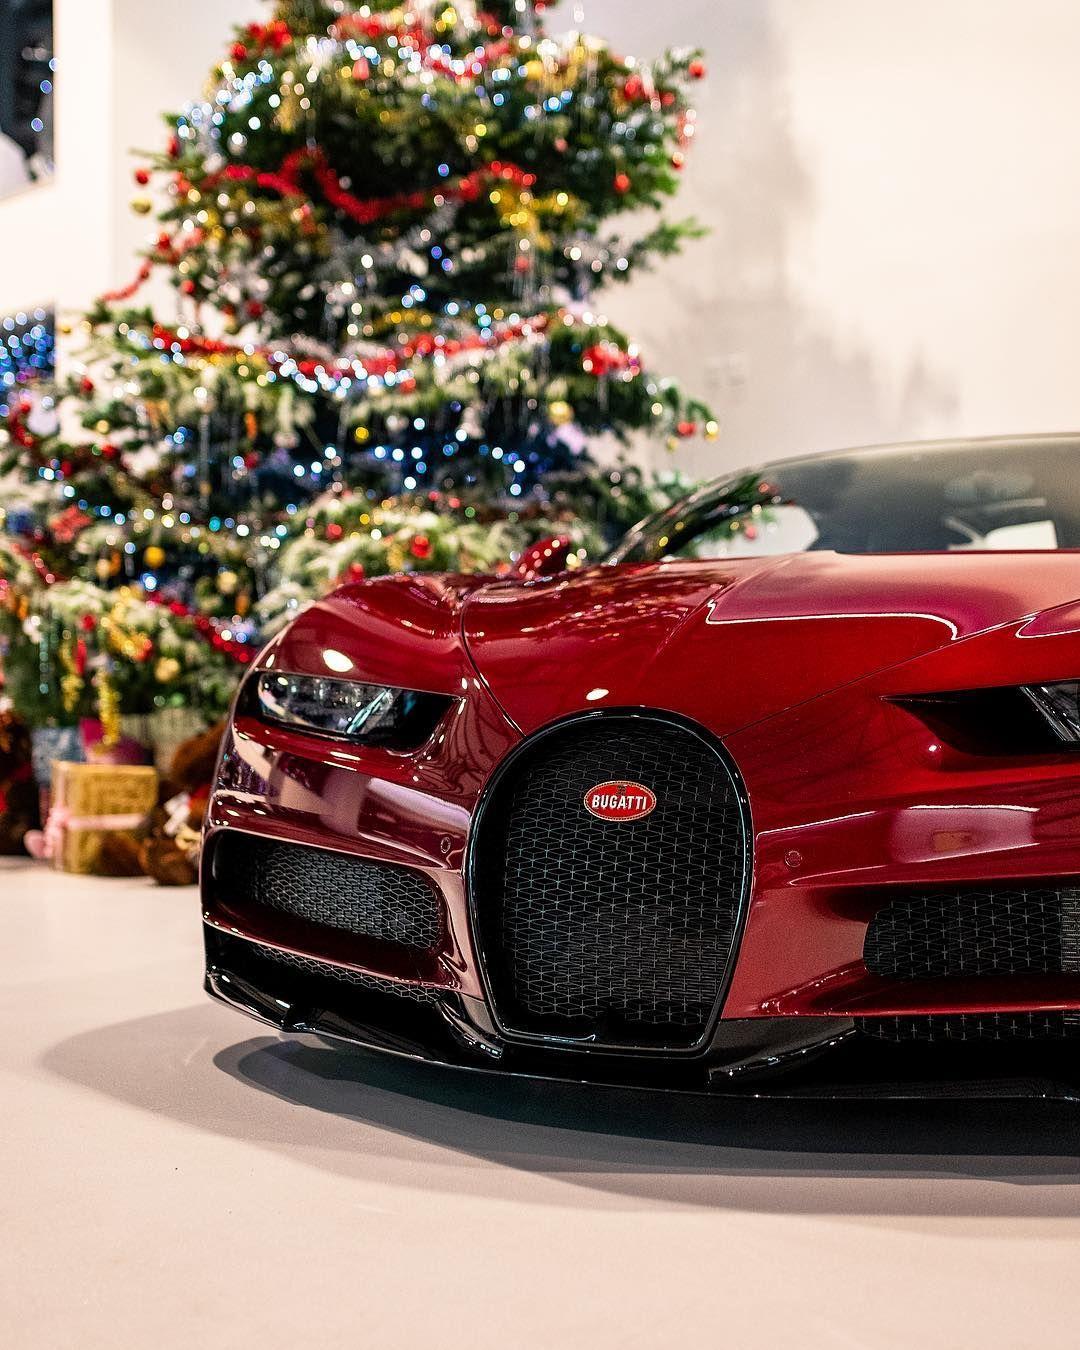 A Very Merry Christmas From All At Joe Macari! 🎄🎅 #bugatti